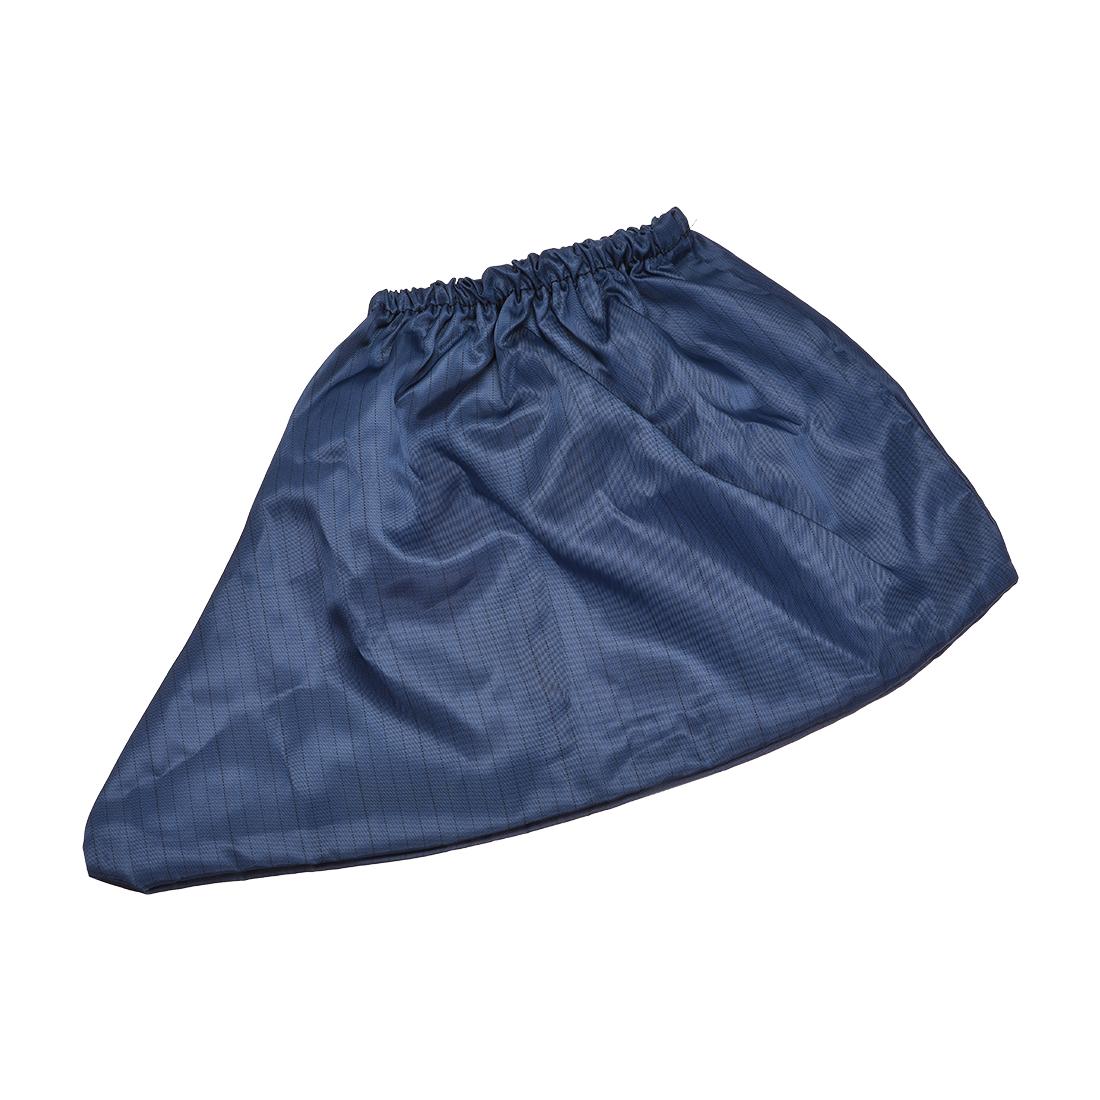 Anti Static Shoe Covers Disposable Slip Resistant Boot Cover Dark Blue 2Pair